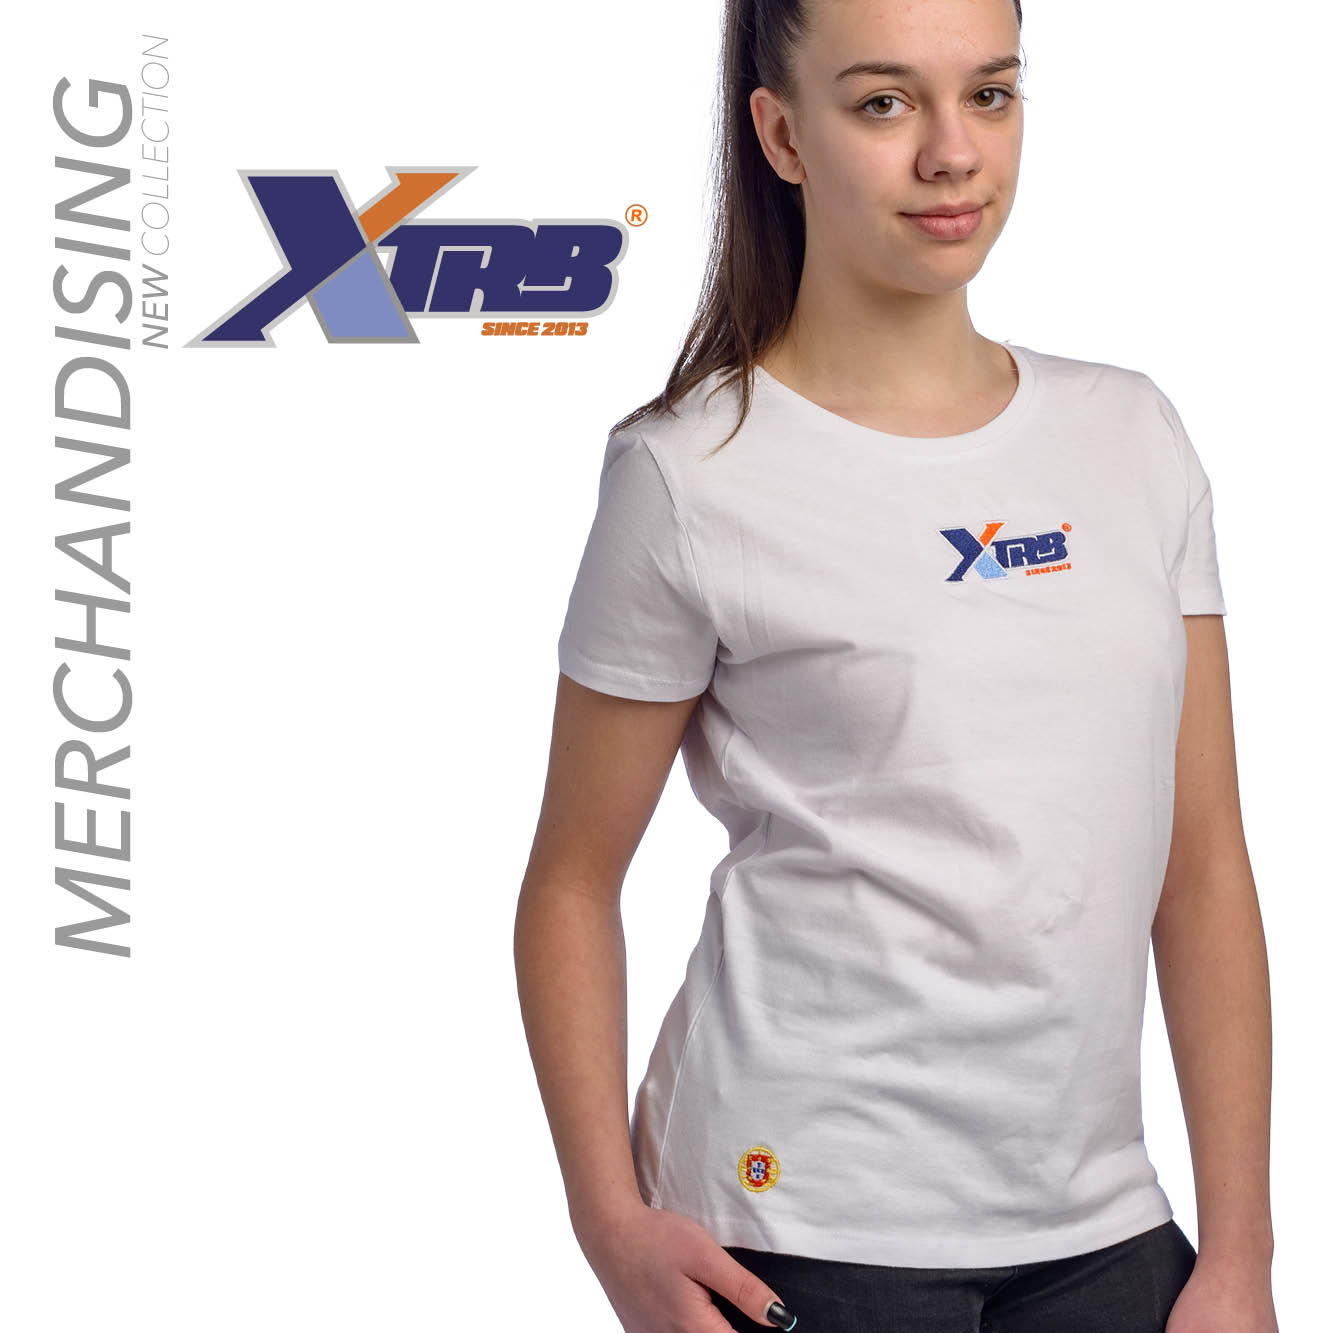 T-shirt Mulher XTRB